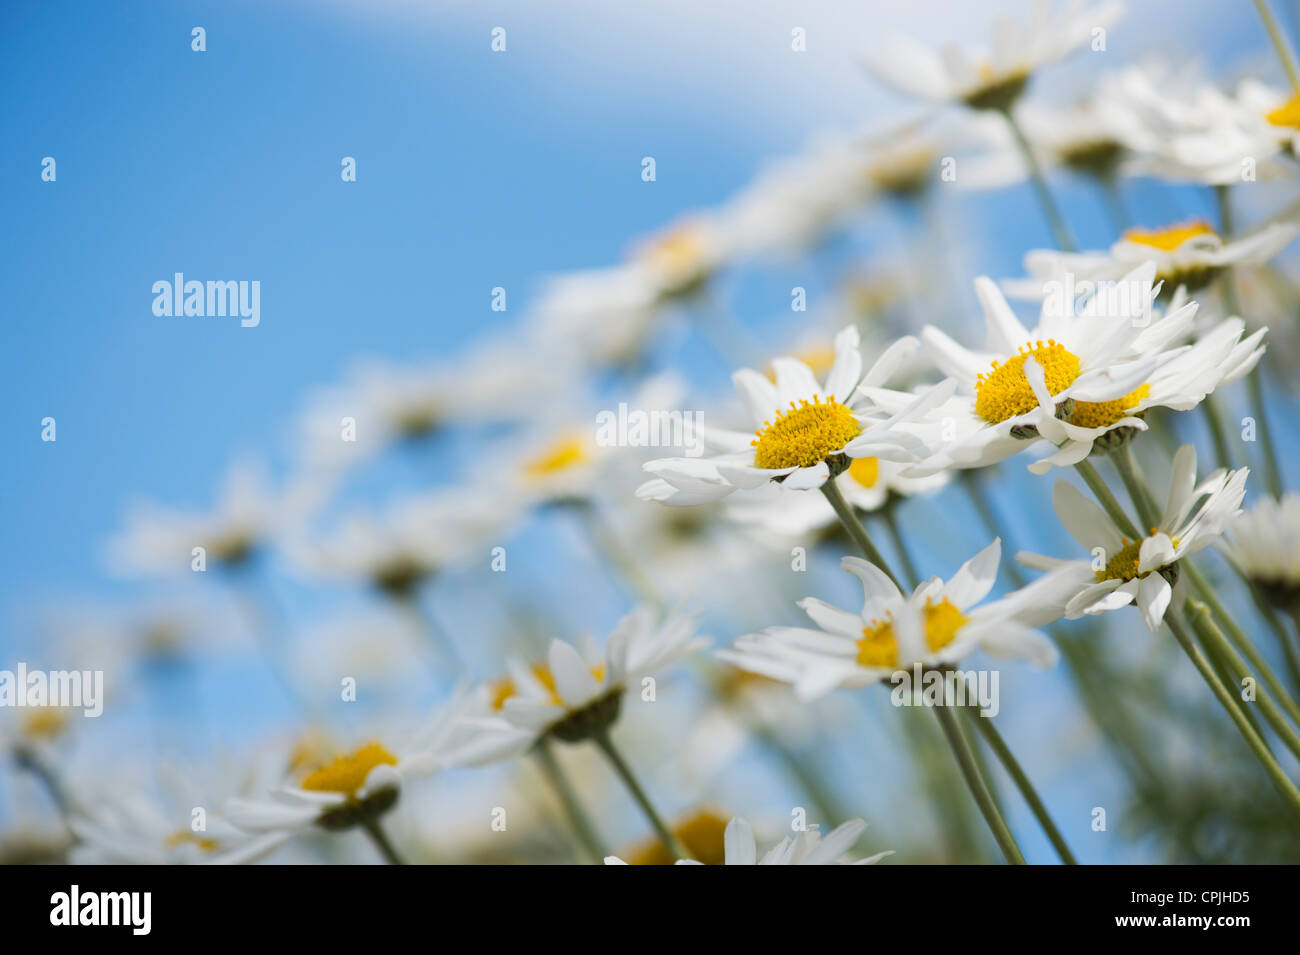 Argyranthemum frutescens 'Madeira White'. Marguerite daisy. Dill daisy flowers against blue sky - Stock Image